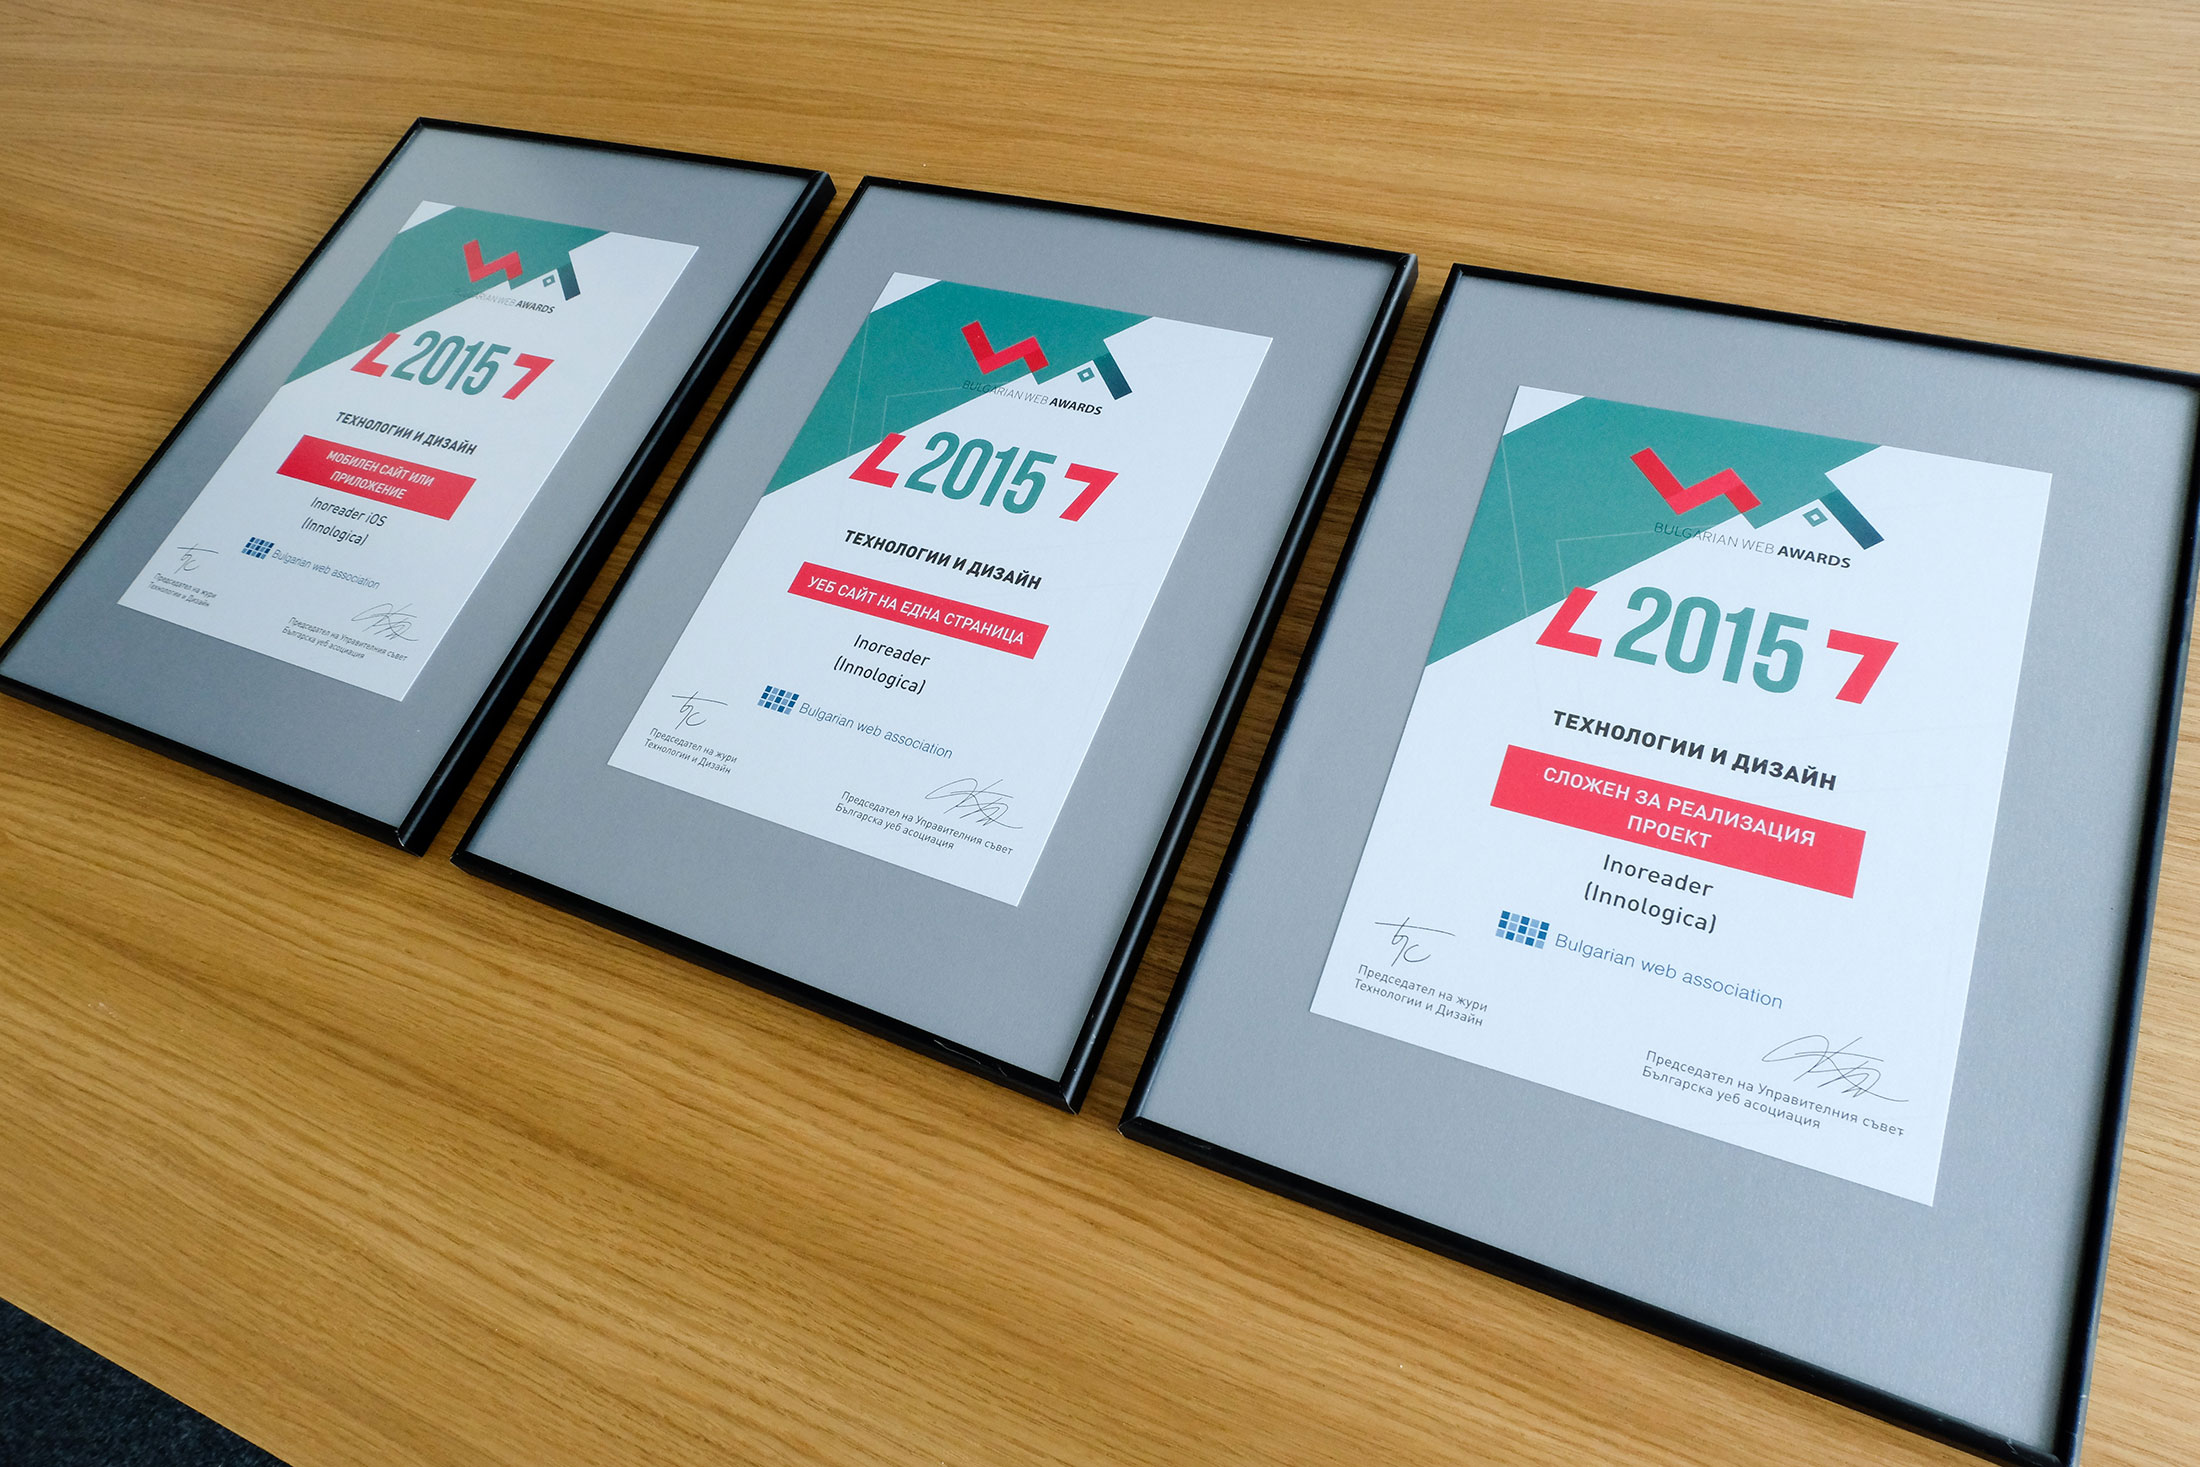 bulgarian web awards 2015